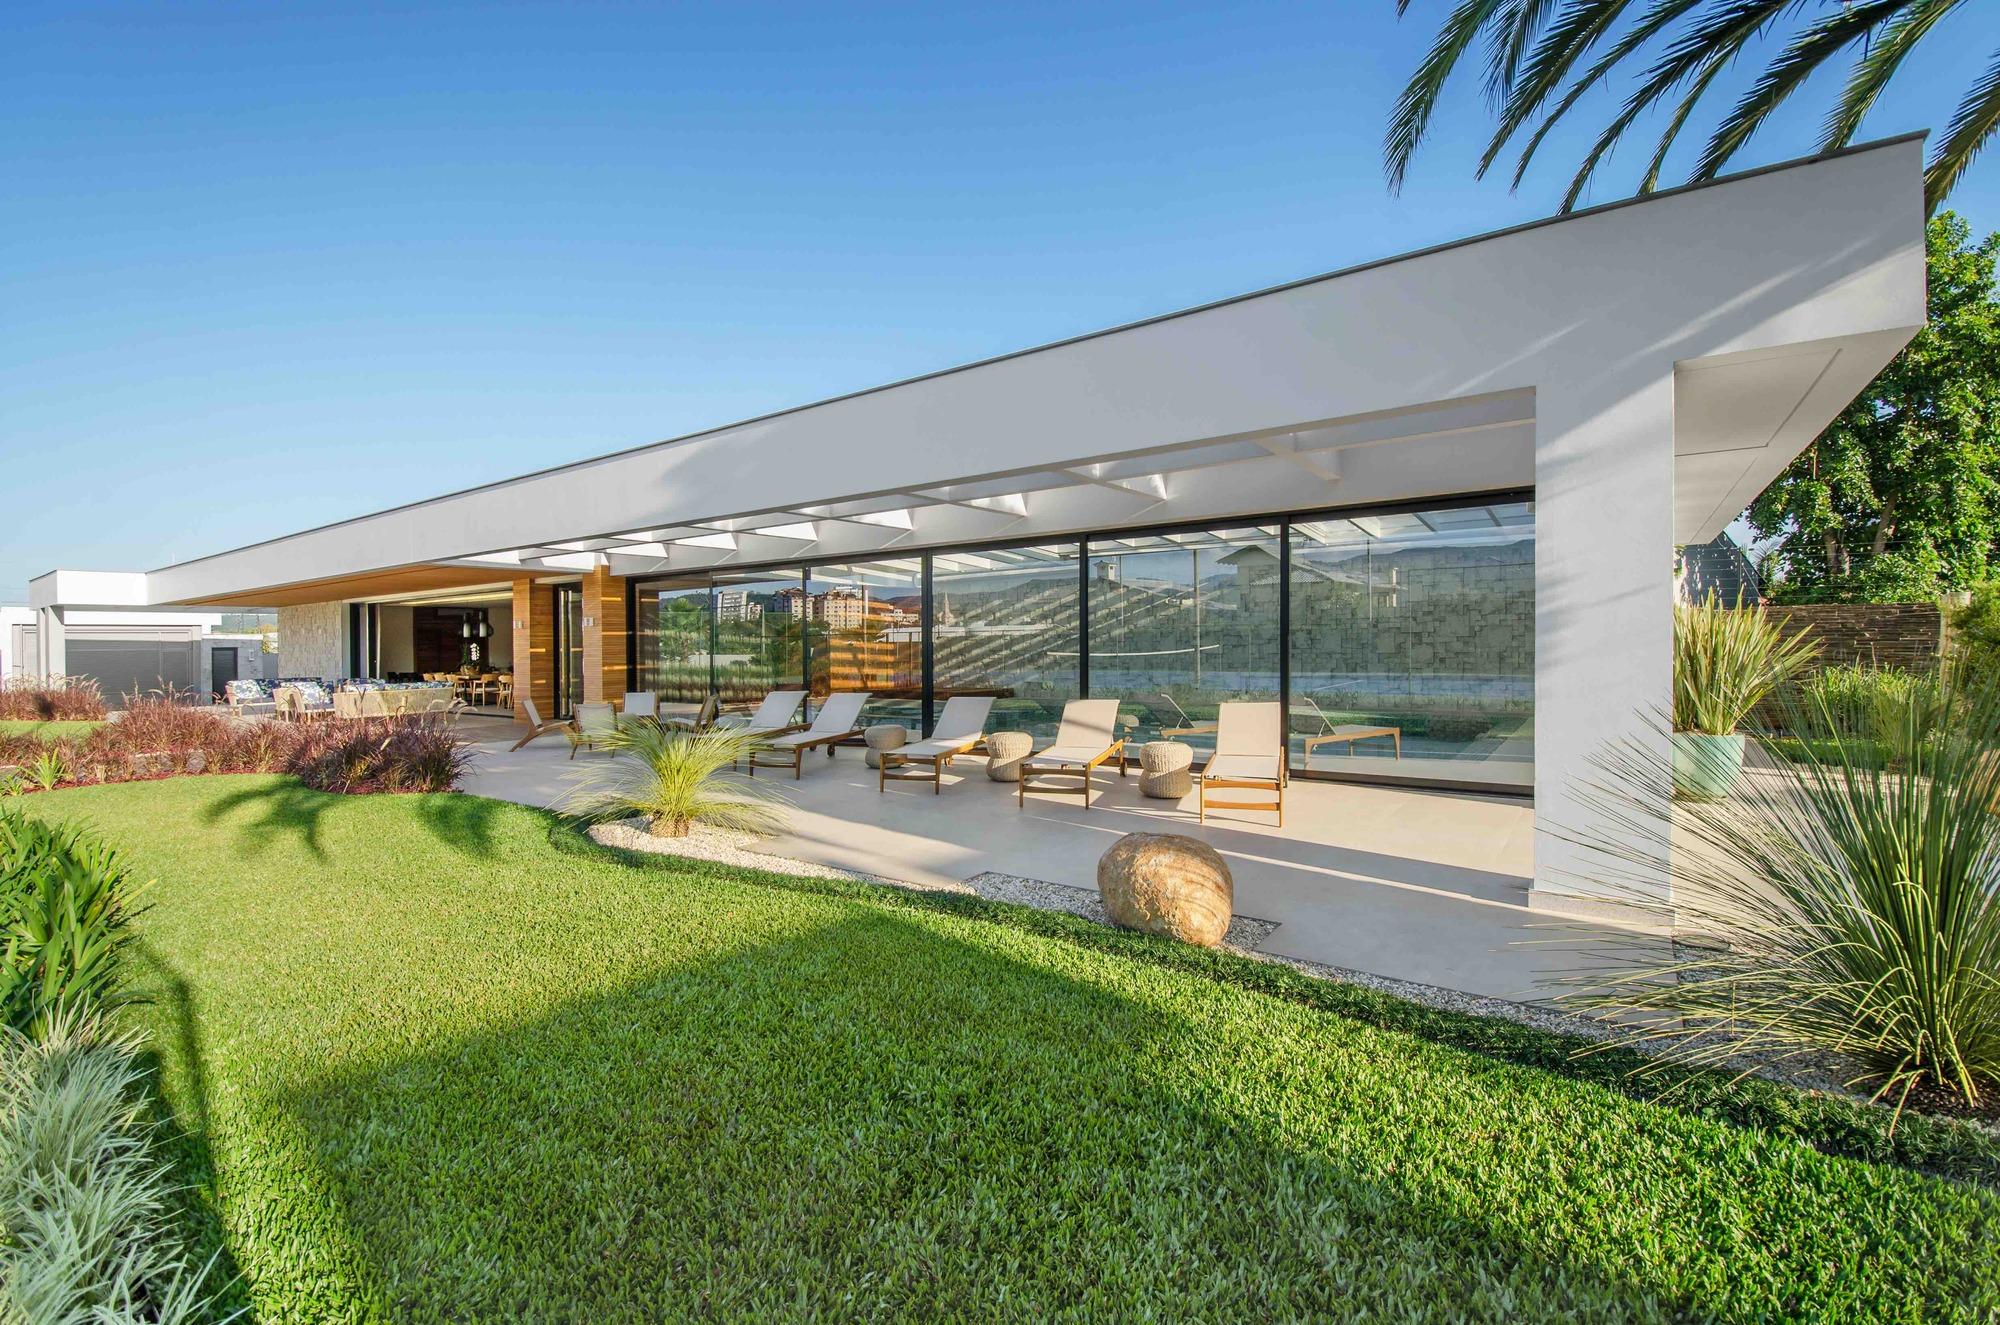 A c house studio colnaghi arquitetura archdaily - Las mejores casas del mundo ...